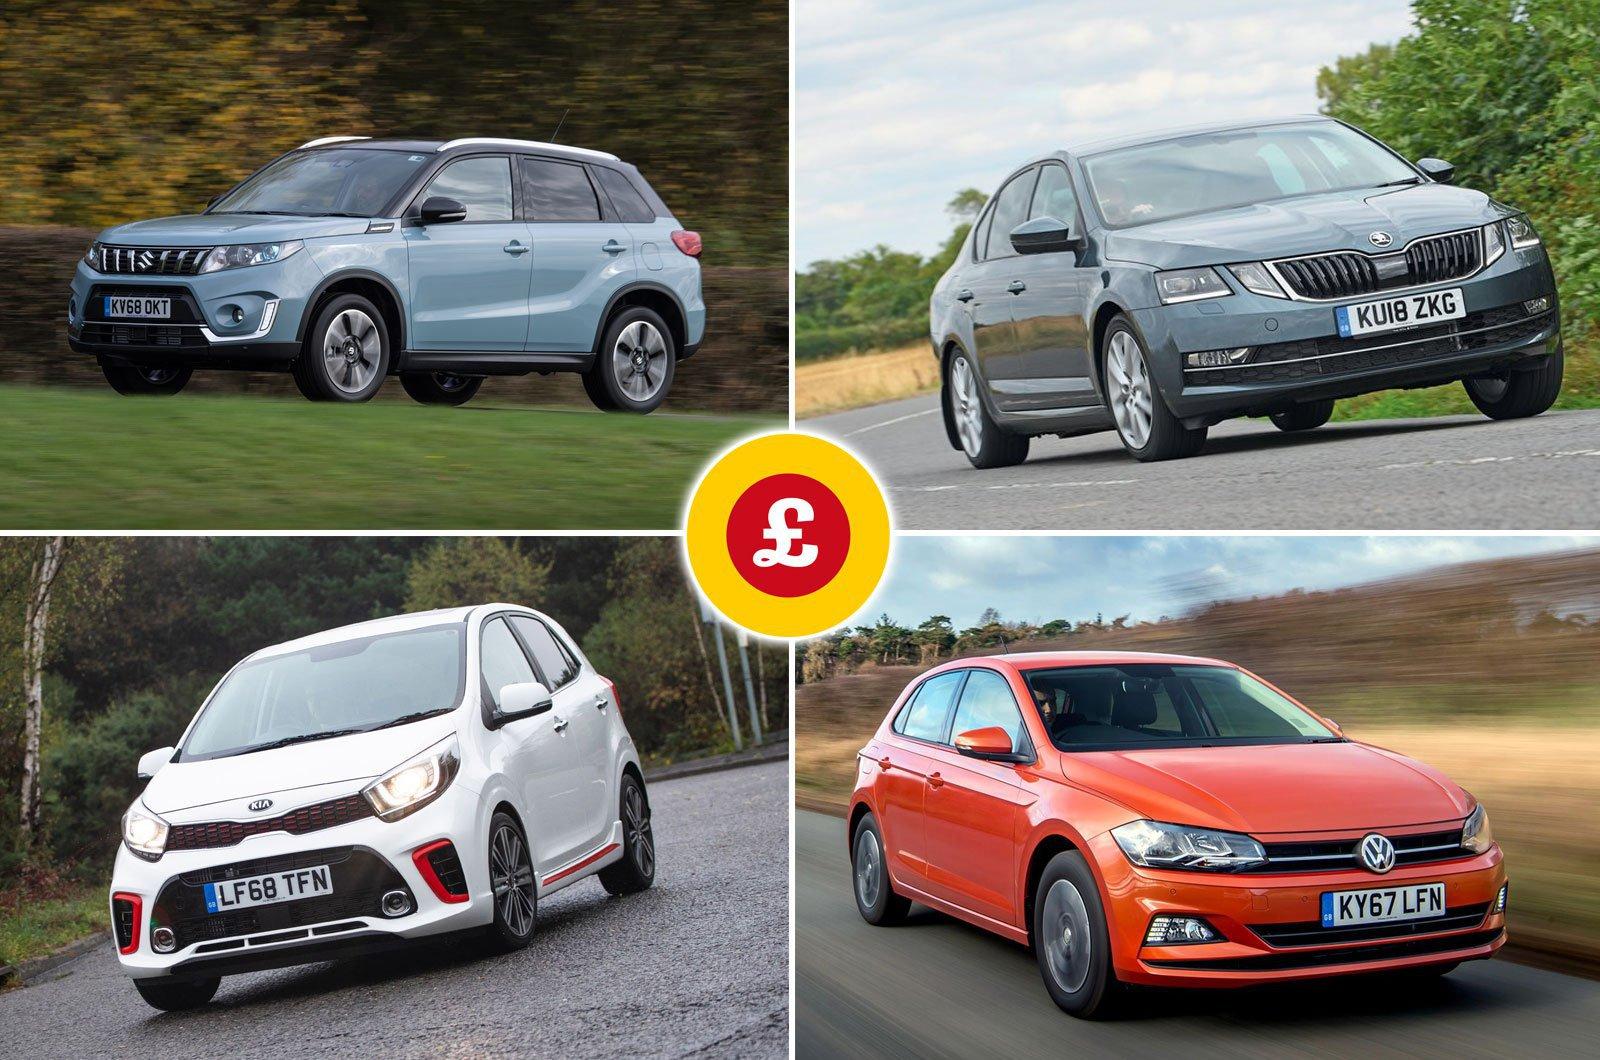 Volkswagen Polo, Skoda Octavia, Suzuki Vitara, Kia Picanto compilation image